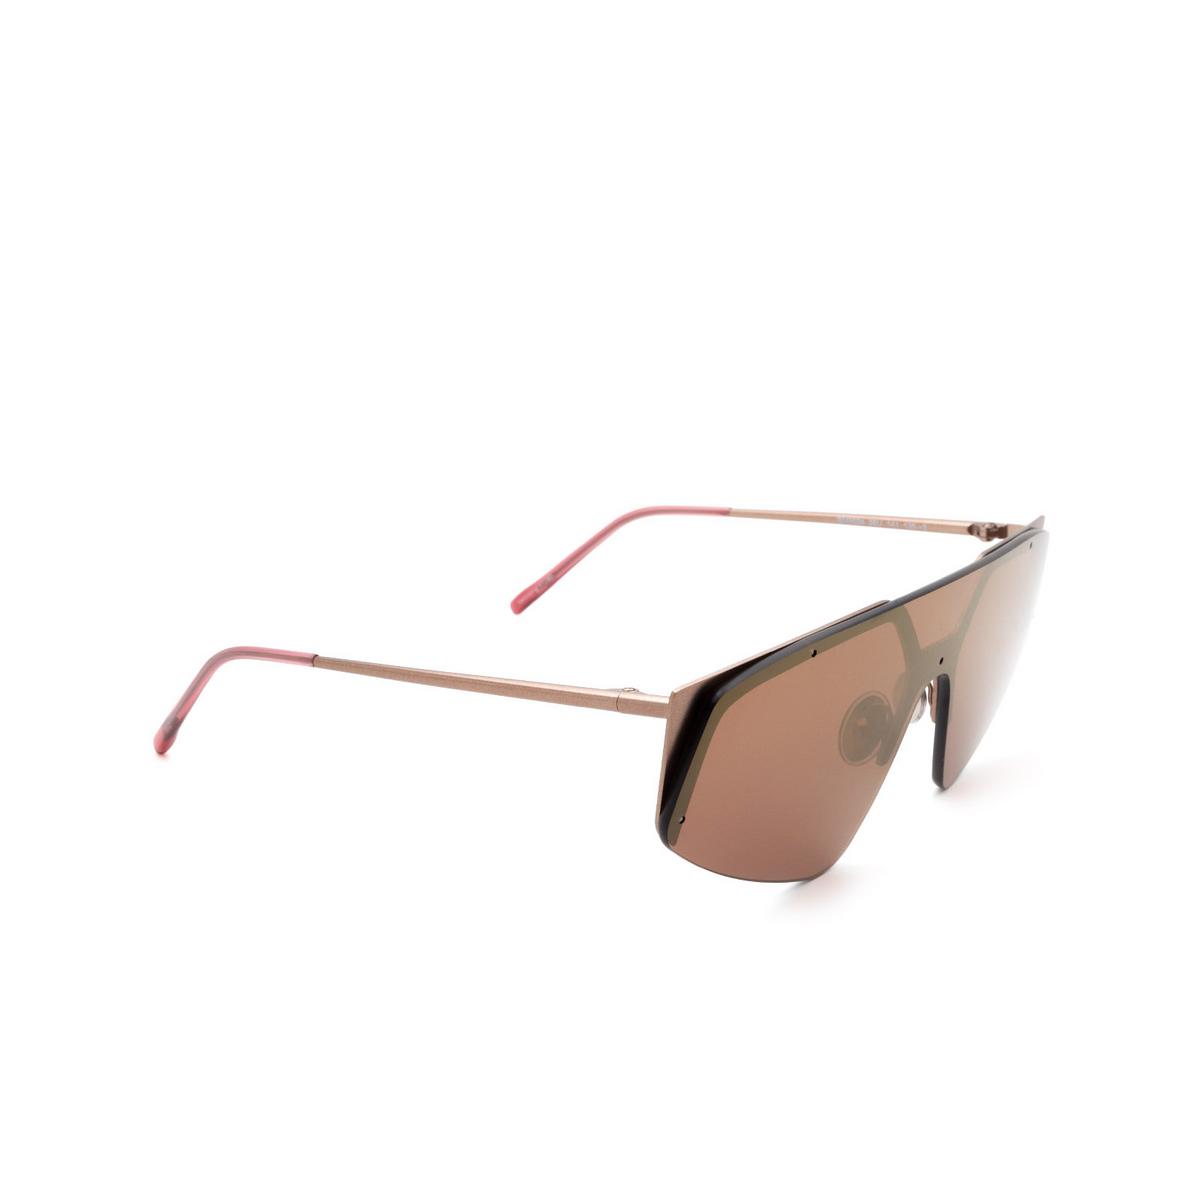 Sportmax® Mask Sunglasses: SM0034 color Bronze 38U - three-quarters view.